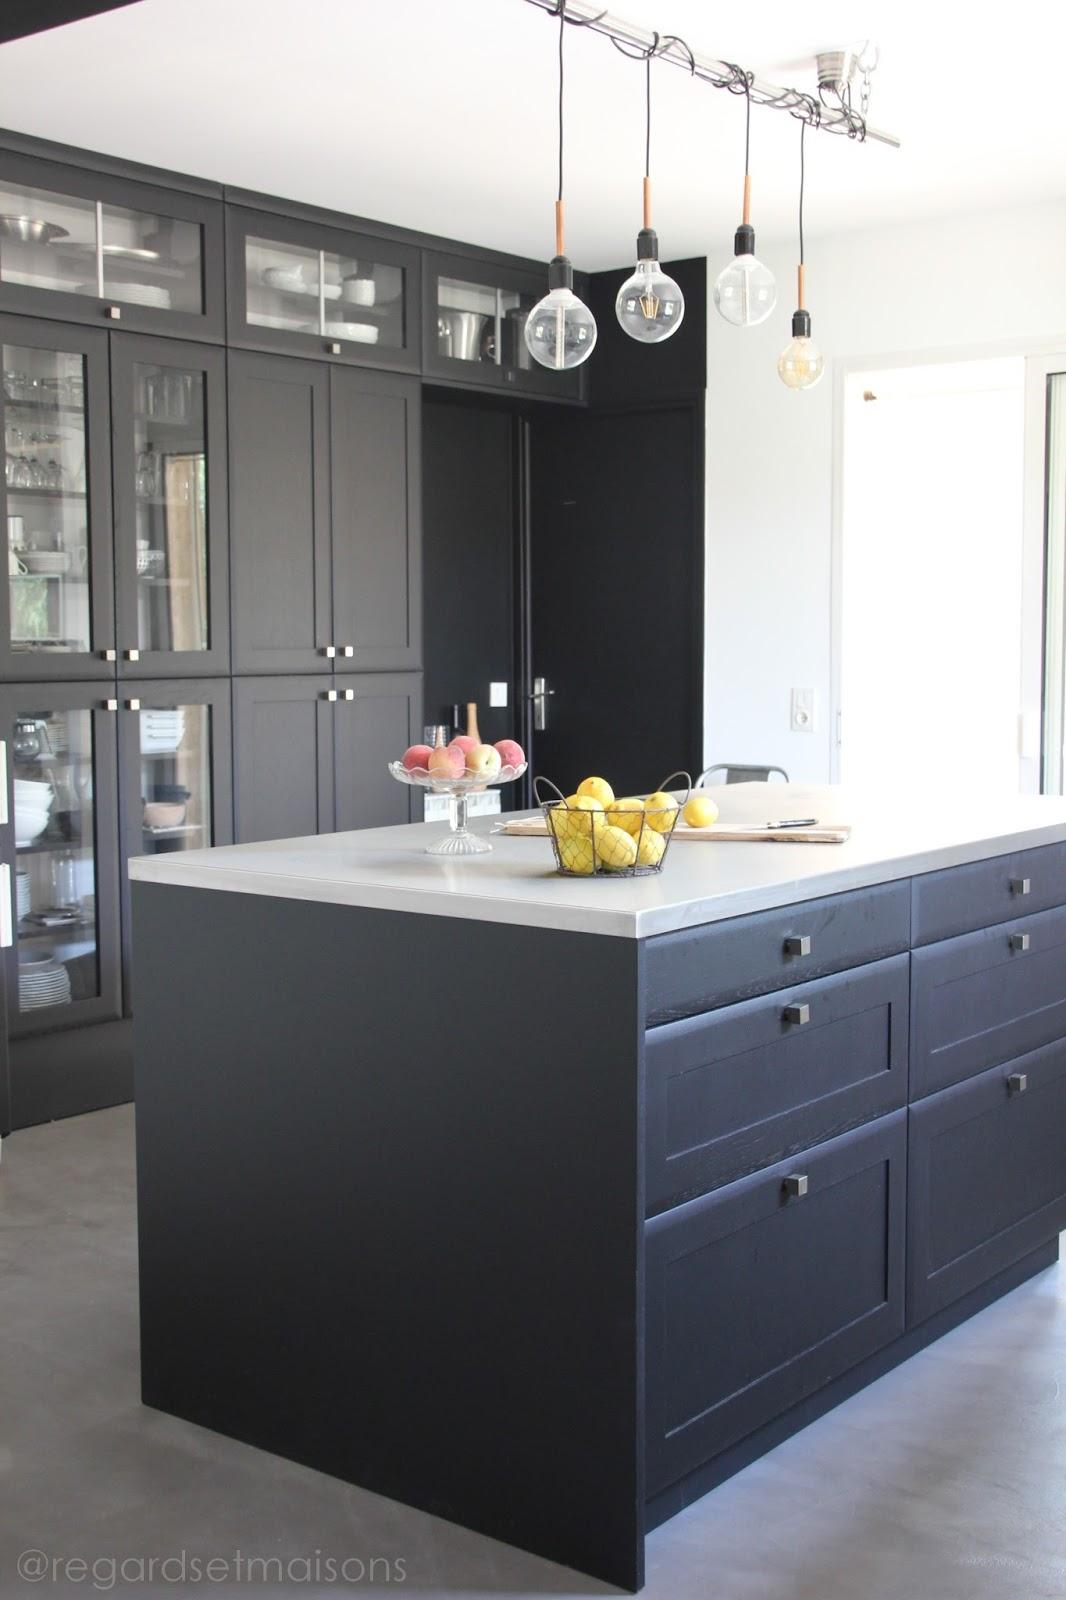 chauffe inox industriel france plan de travail gres cerame. Black Bedroom Furniture Sets. Home Design Ideas